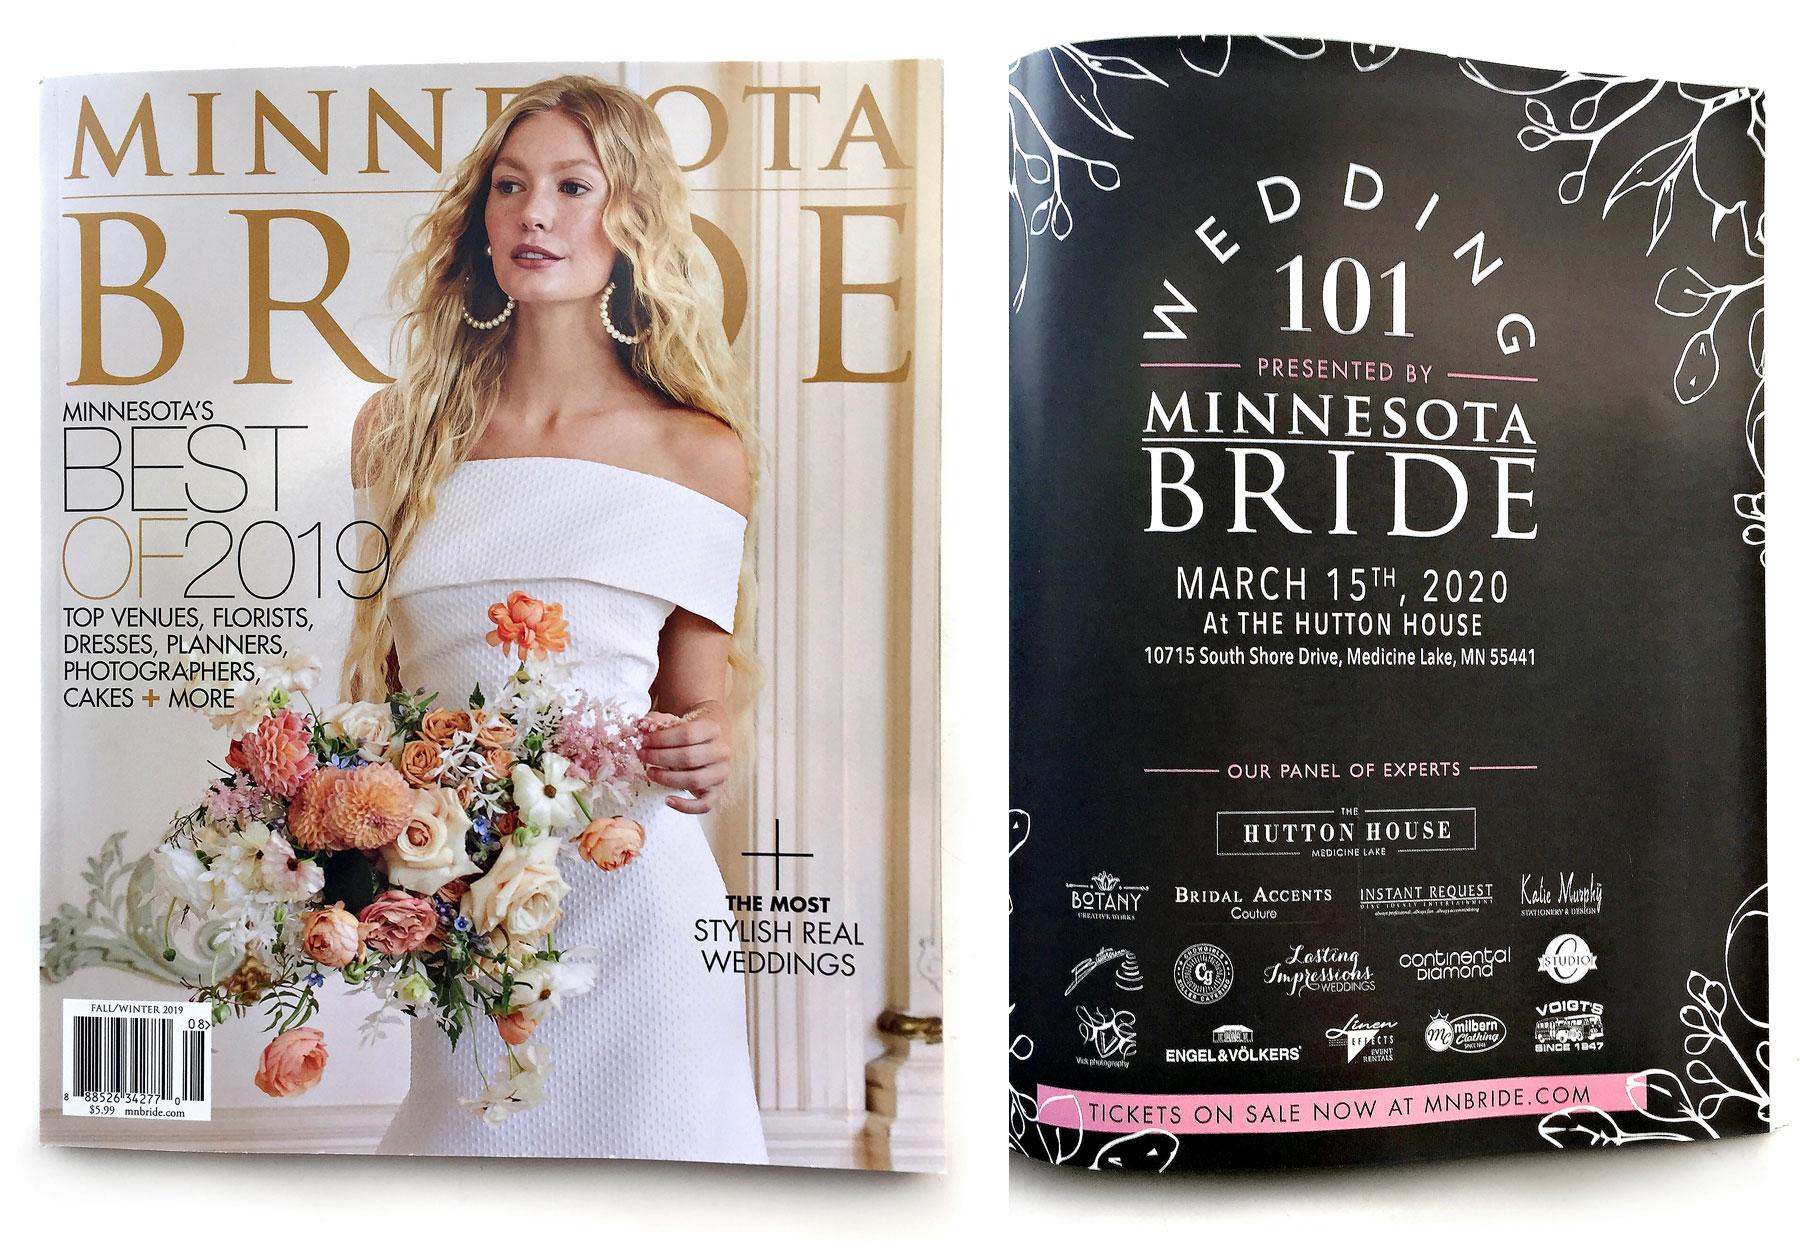 01-Minnesota-Bride-Magazine-2019-Fall-Winter-Vick-Photography-Best-Of-Awards.jpg